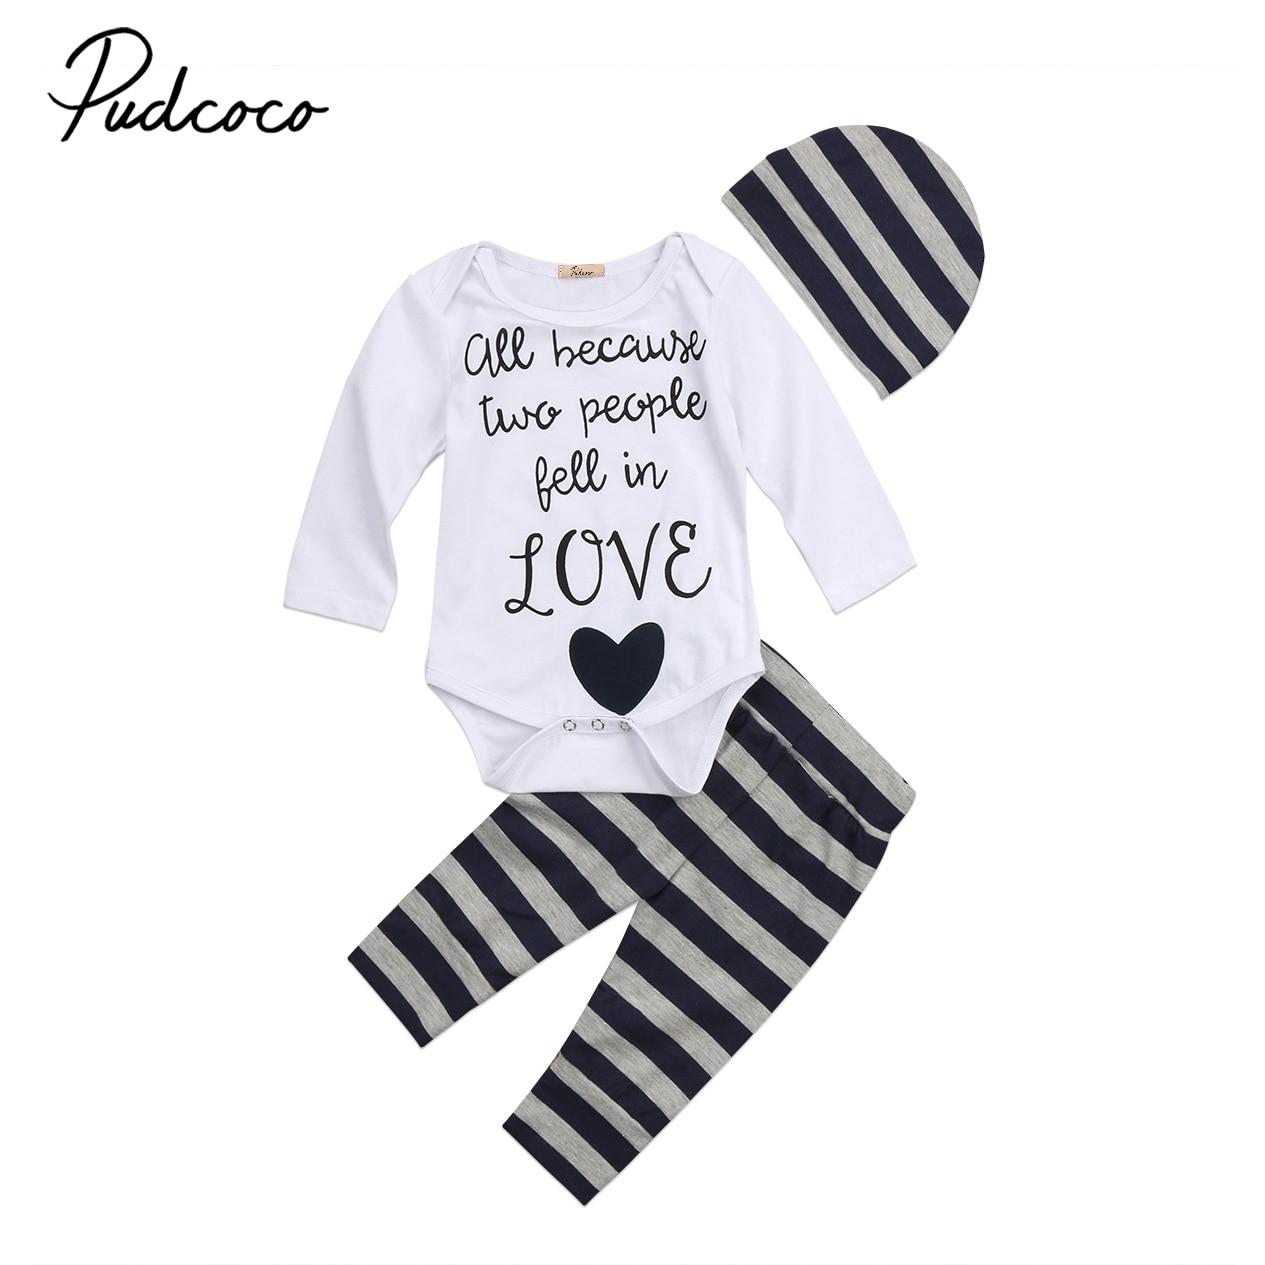 3PC Baby Boy Letters Print Clothes Outfit Infant Kids Long Sleeve Cotton Romper Tops+Stripes Pants+Hat Clothing Set Autumn